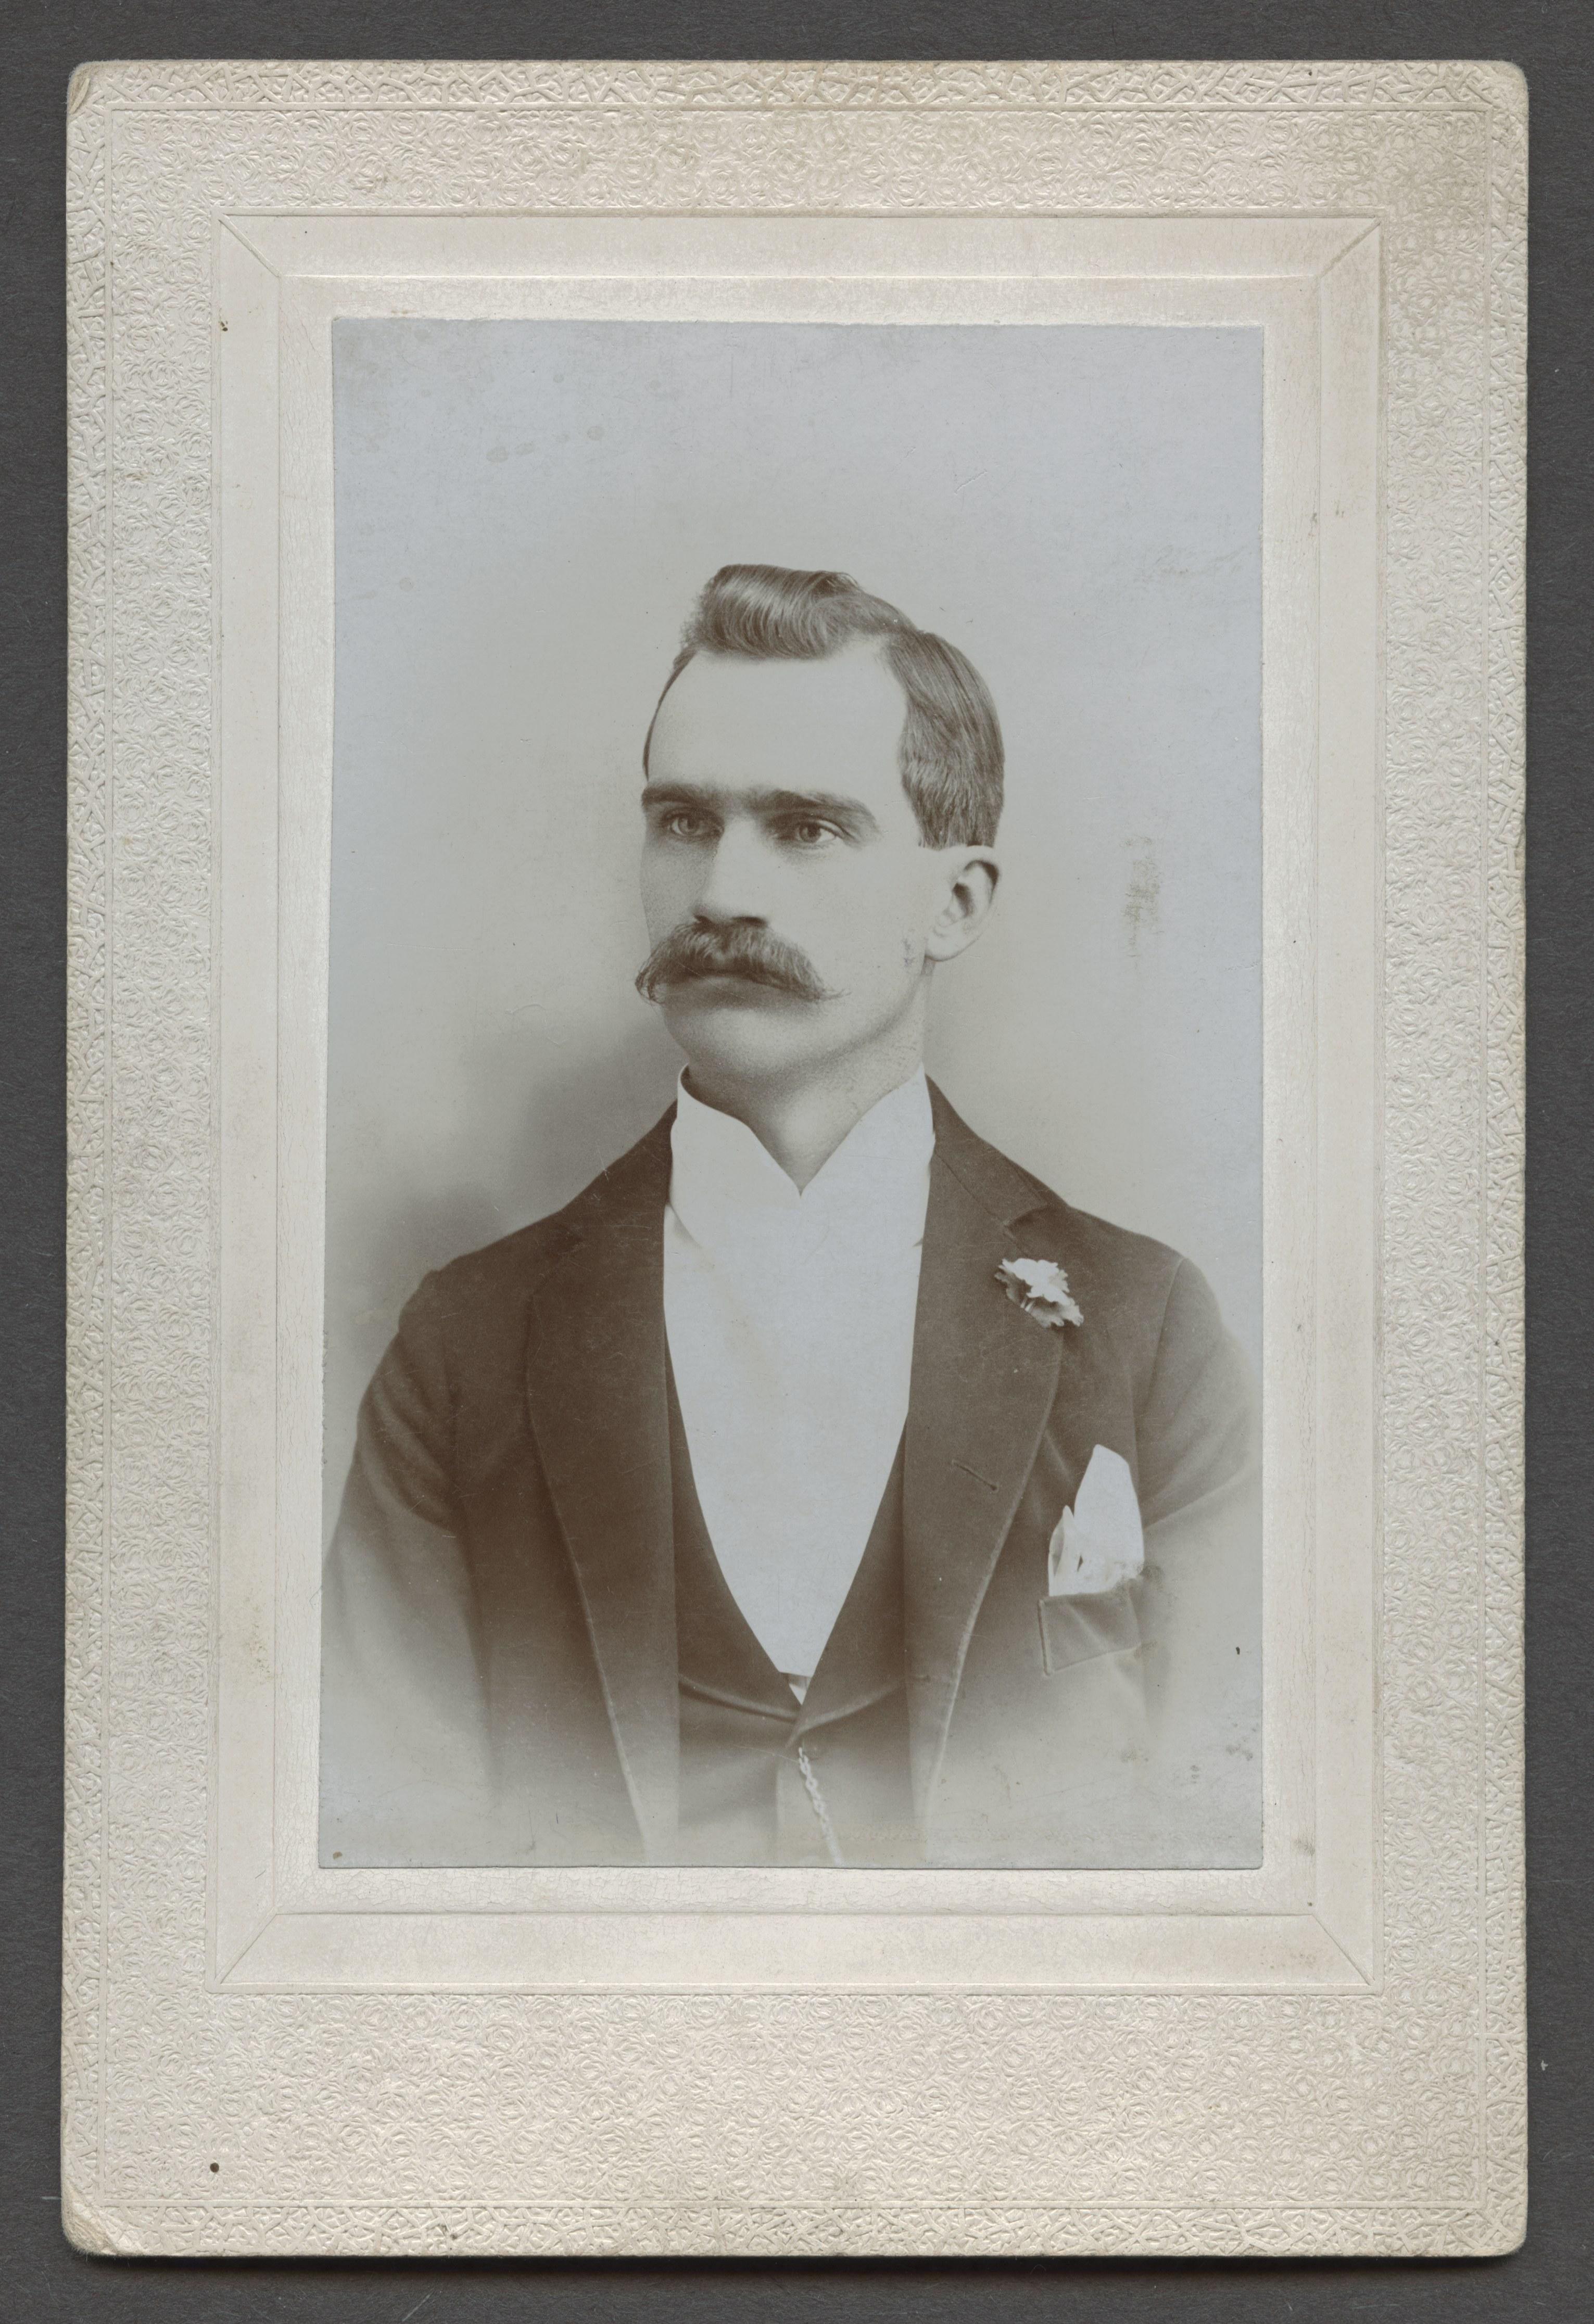 Beesley, Alvin Augustus